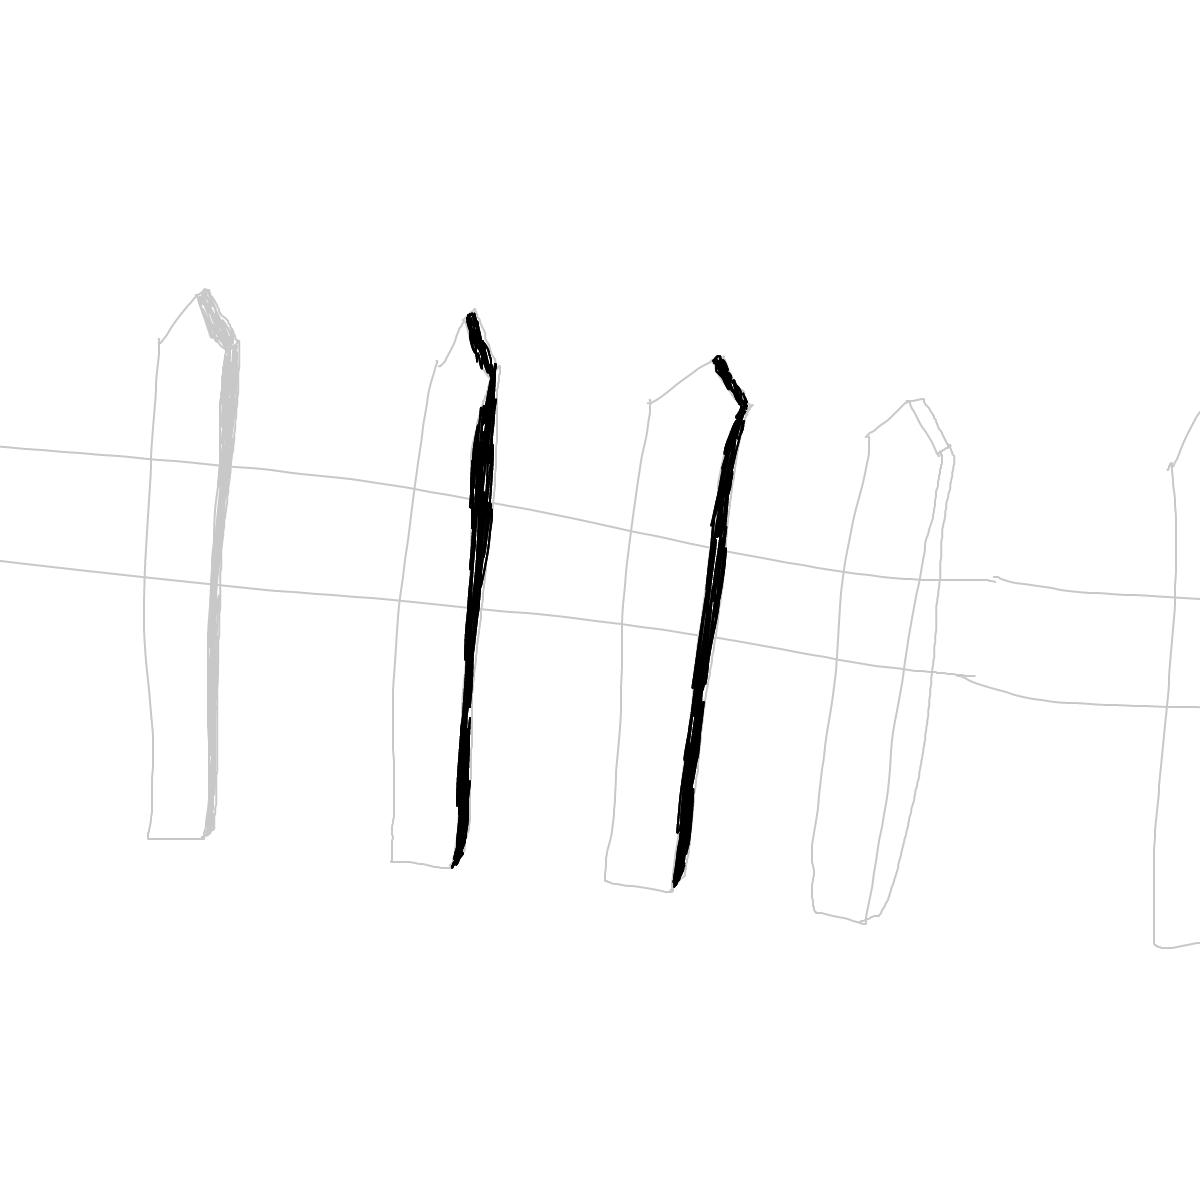 BAAAM drawing#9377 lat:52.4750518798828100lng: 13.4071931838989260